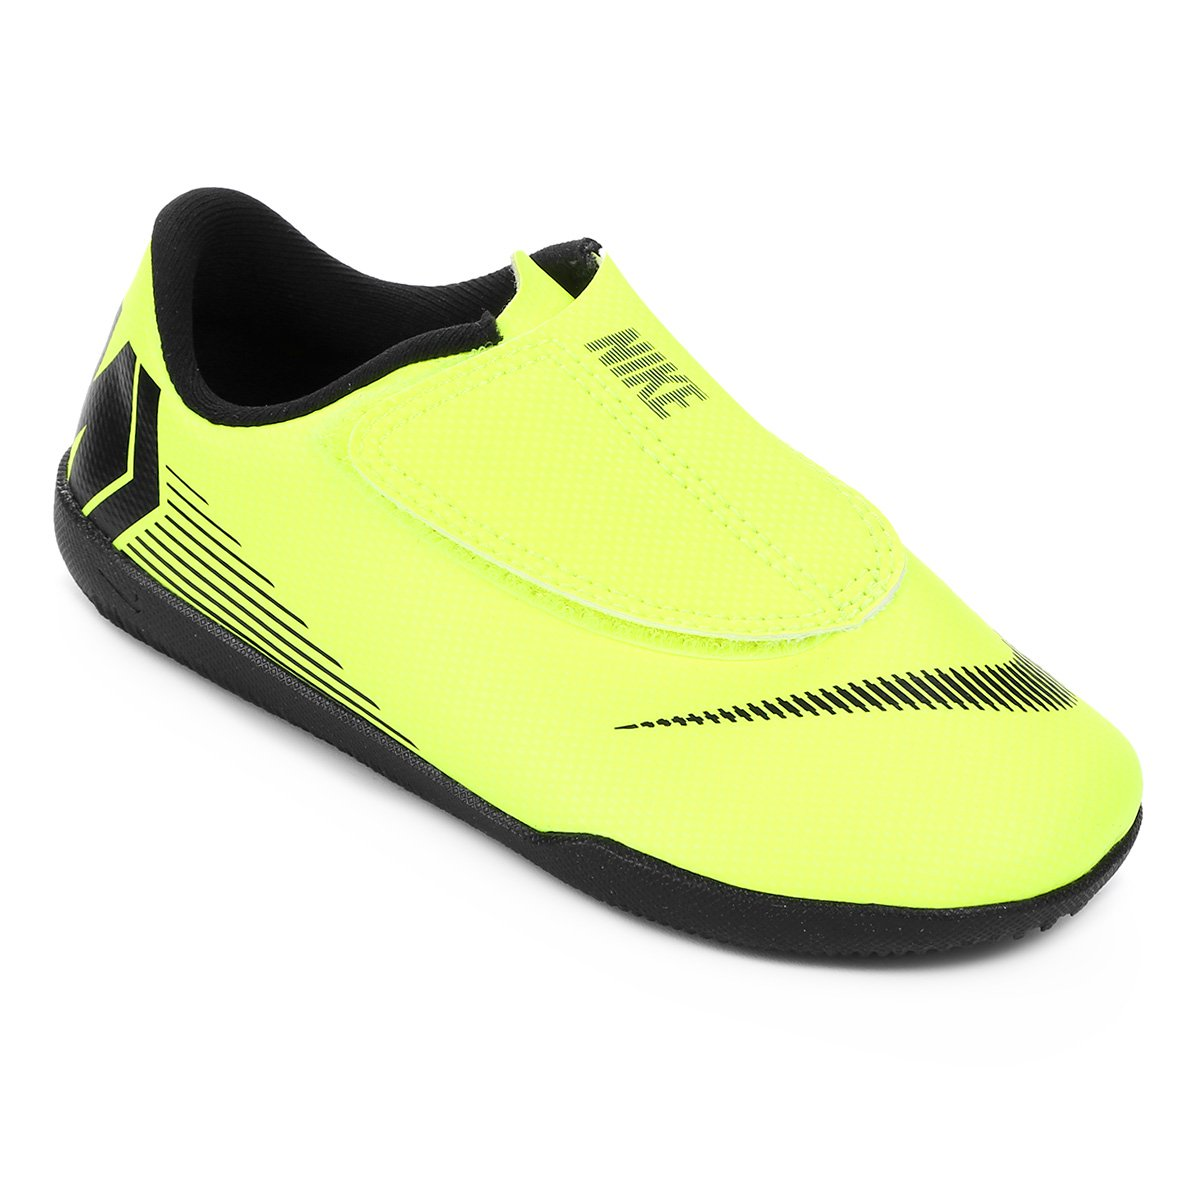 6a68fd0487 Chuteira Futsal Infantil Nike Mercurial Vapor 12 Club PS IC ...